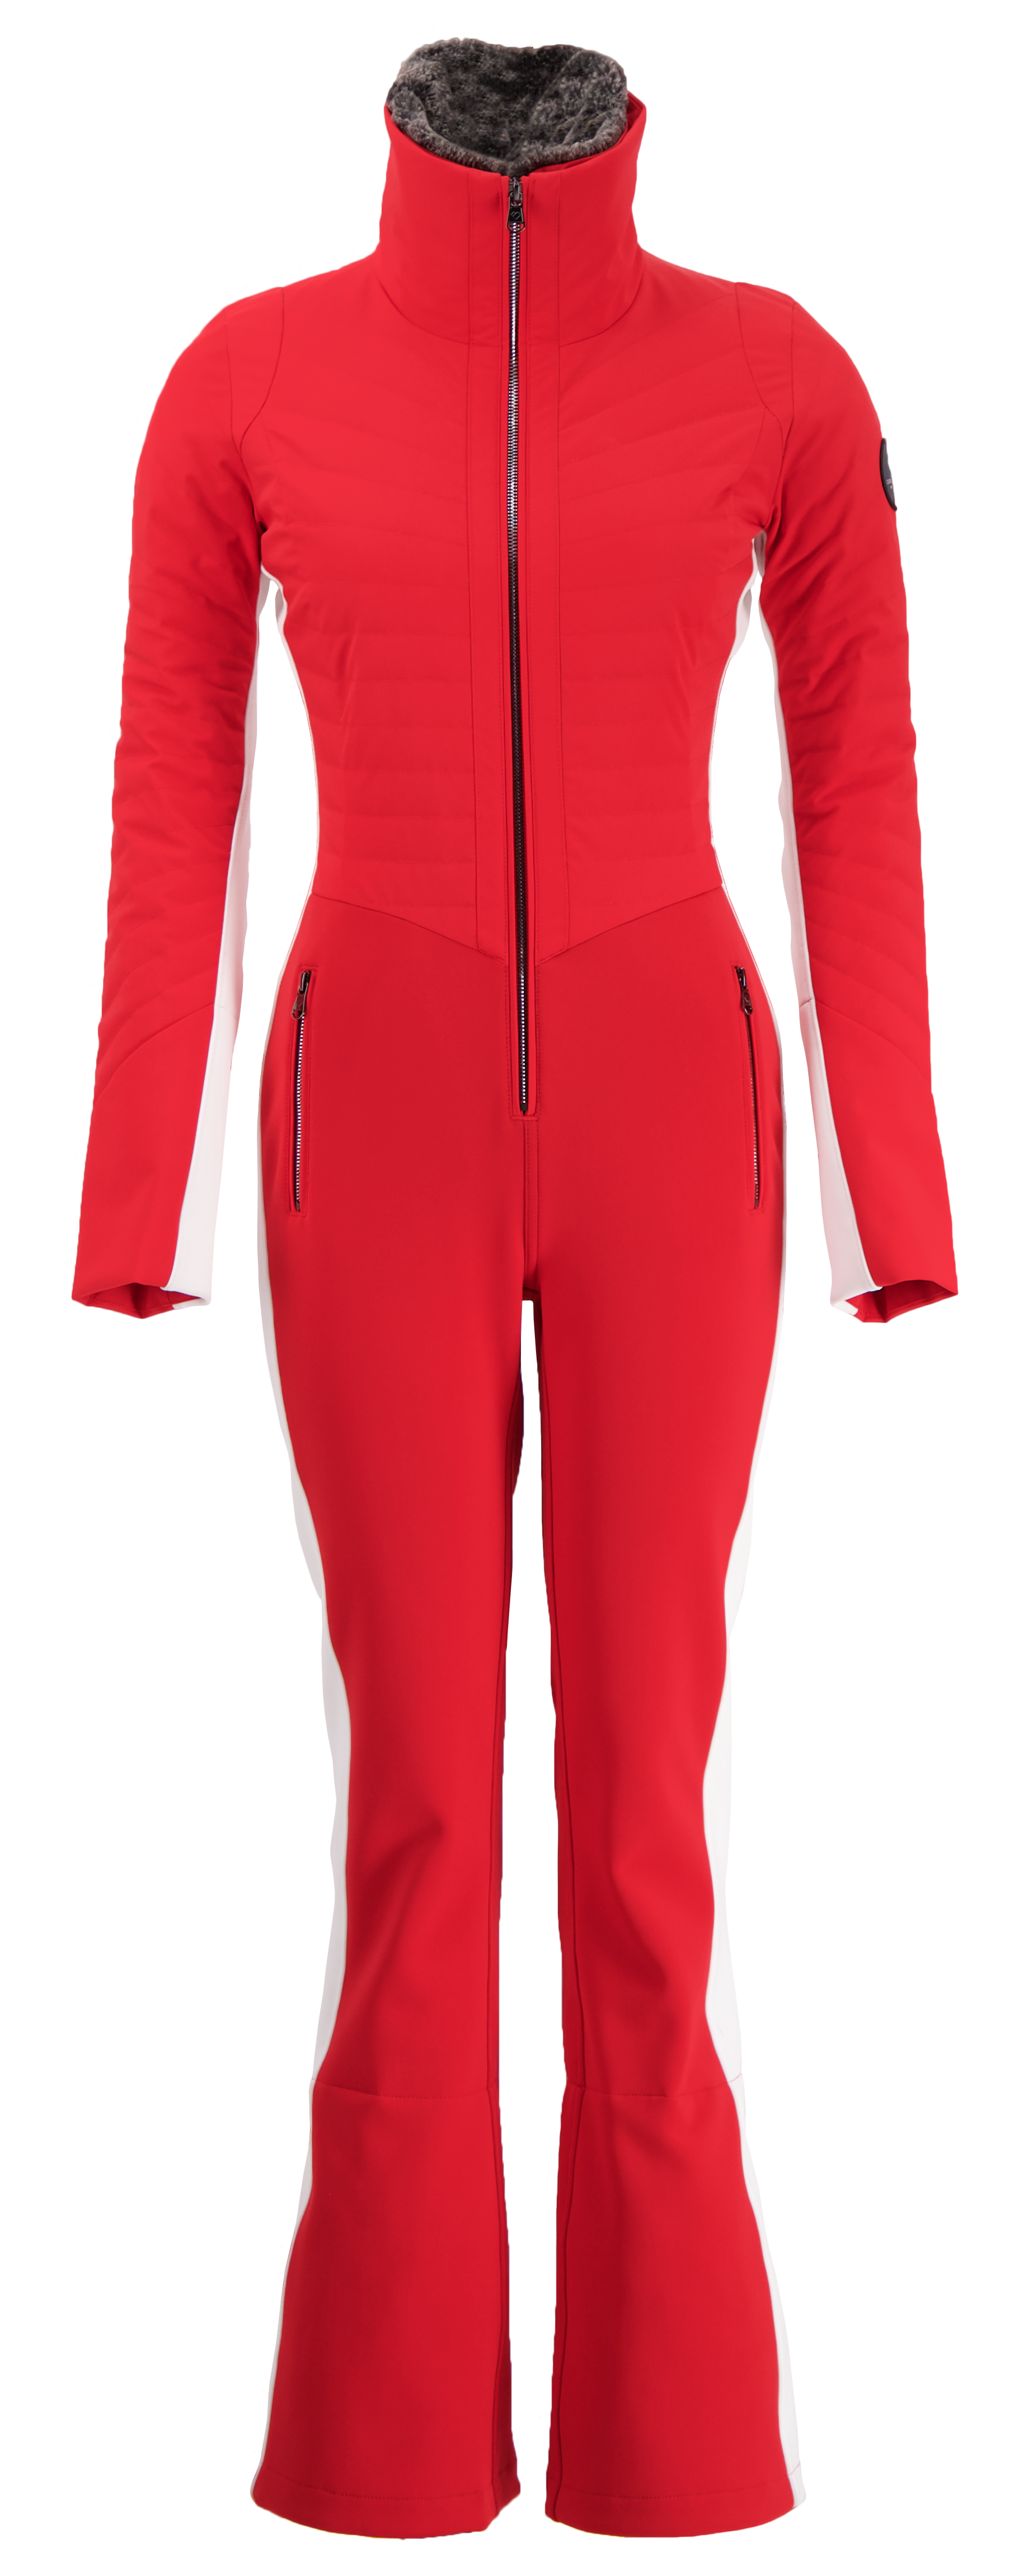 salomon skiwear trend